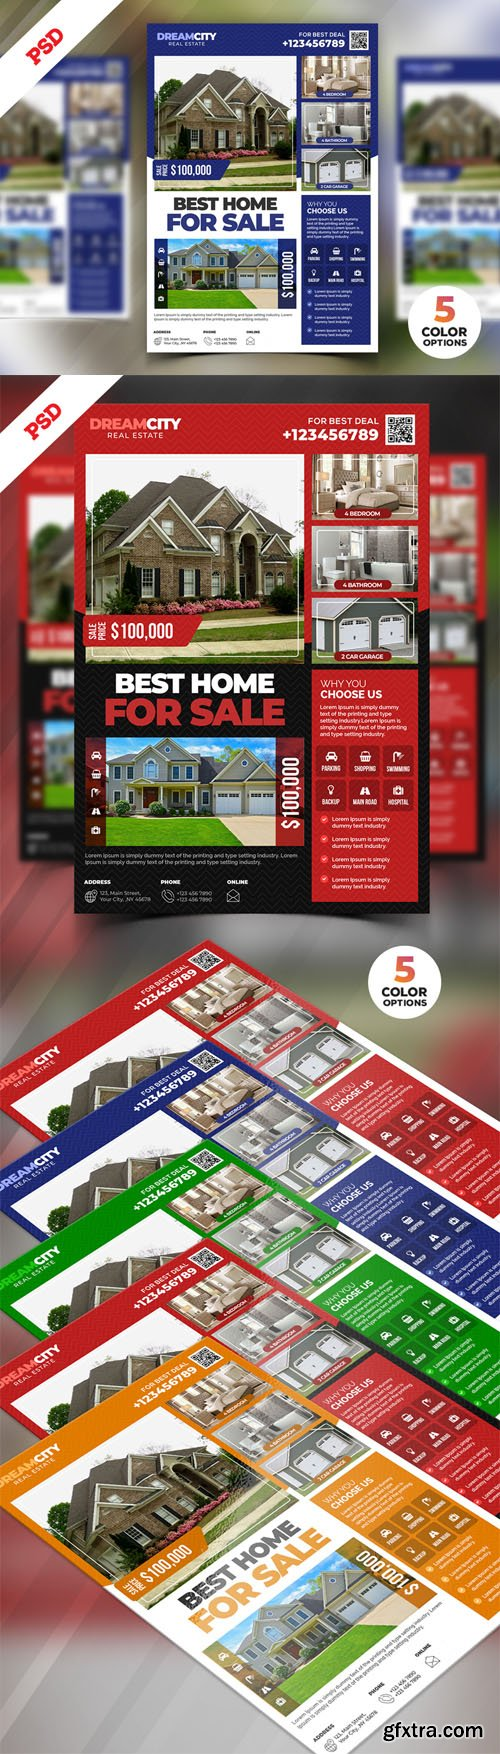 Real Estate Flyer Design PSD Templates